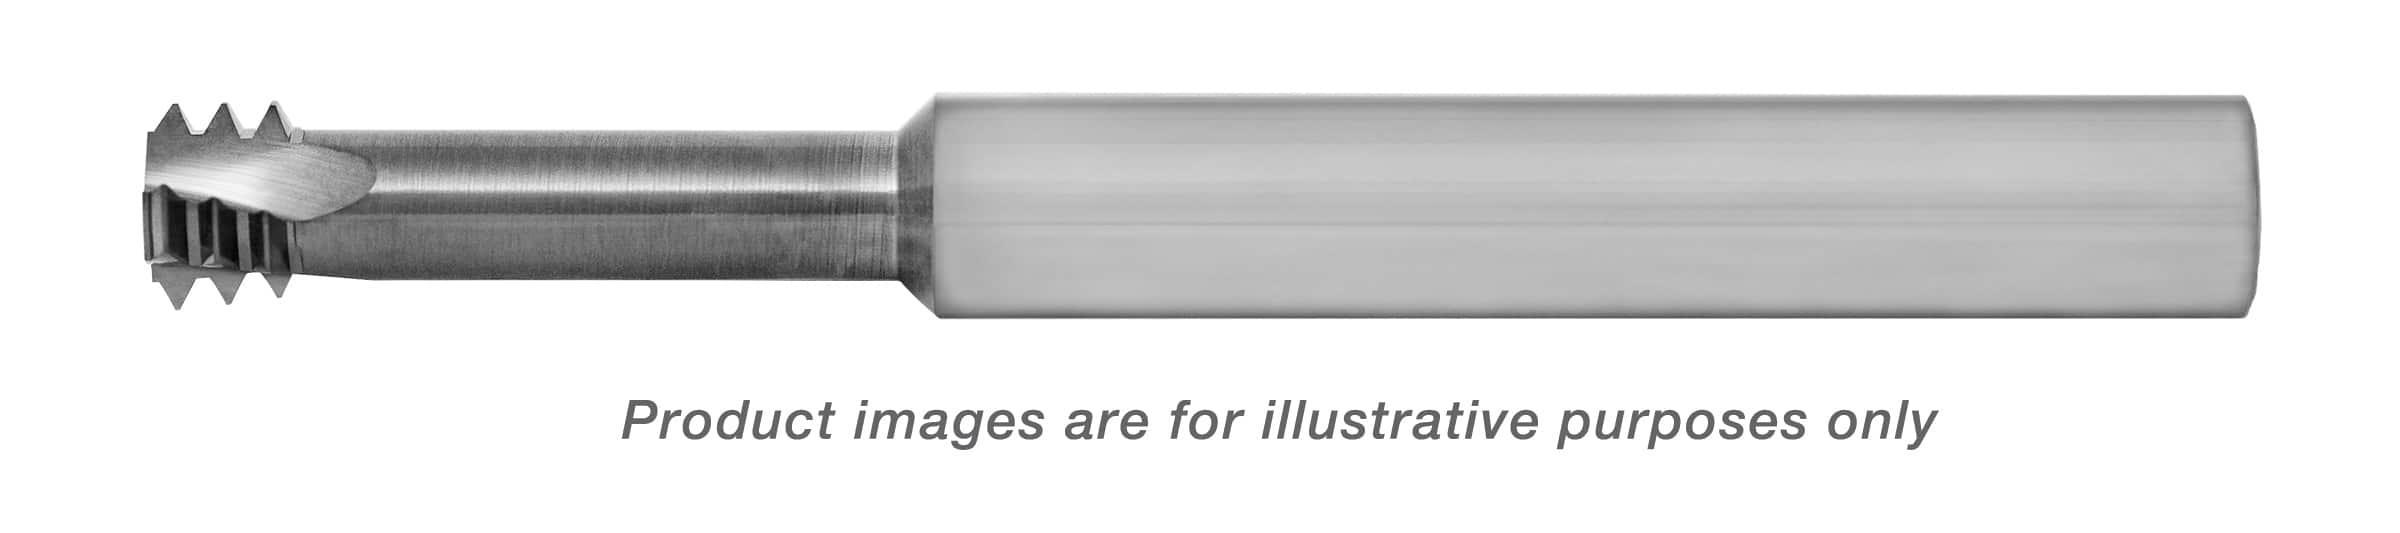 LONG REACH THREAD MILL CARBIDE ALTiN (M8-1 PITCH) INTERNAL .234 DIA X .850-NECK (1/4 SHANK) 2-1/2 OAL